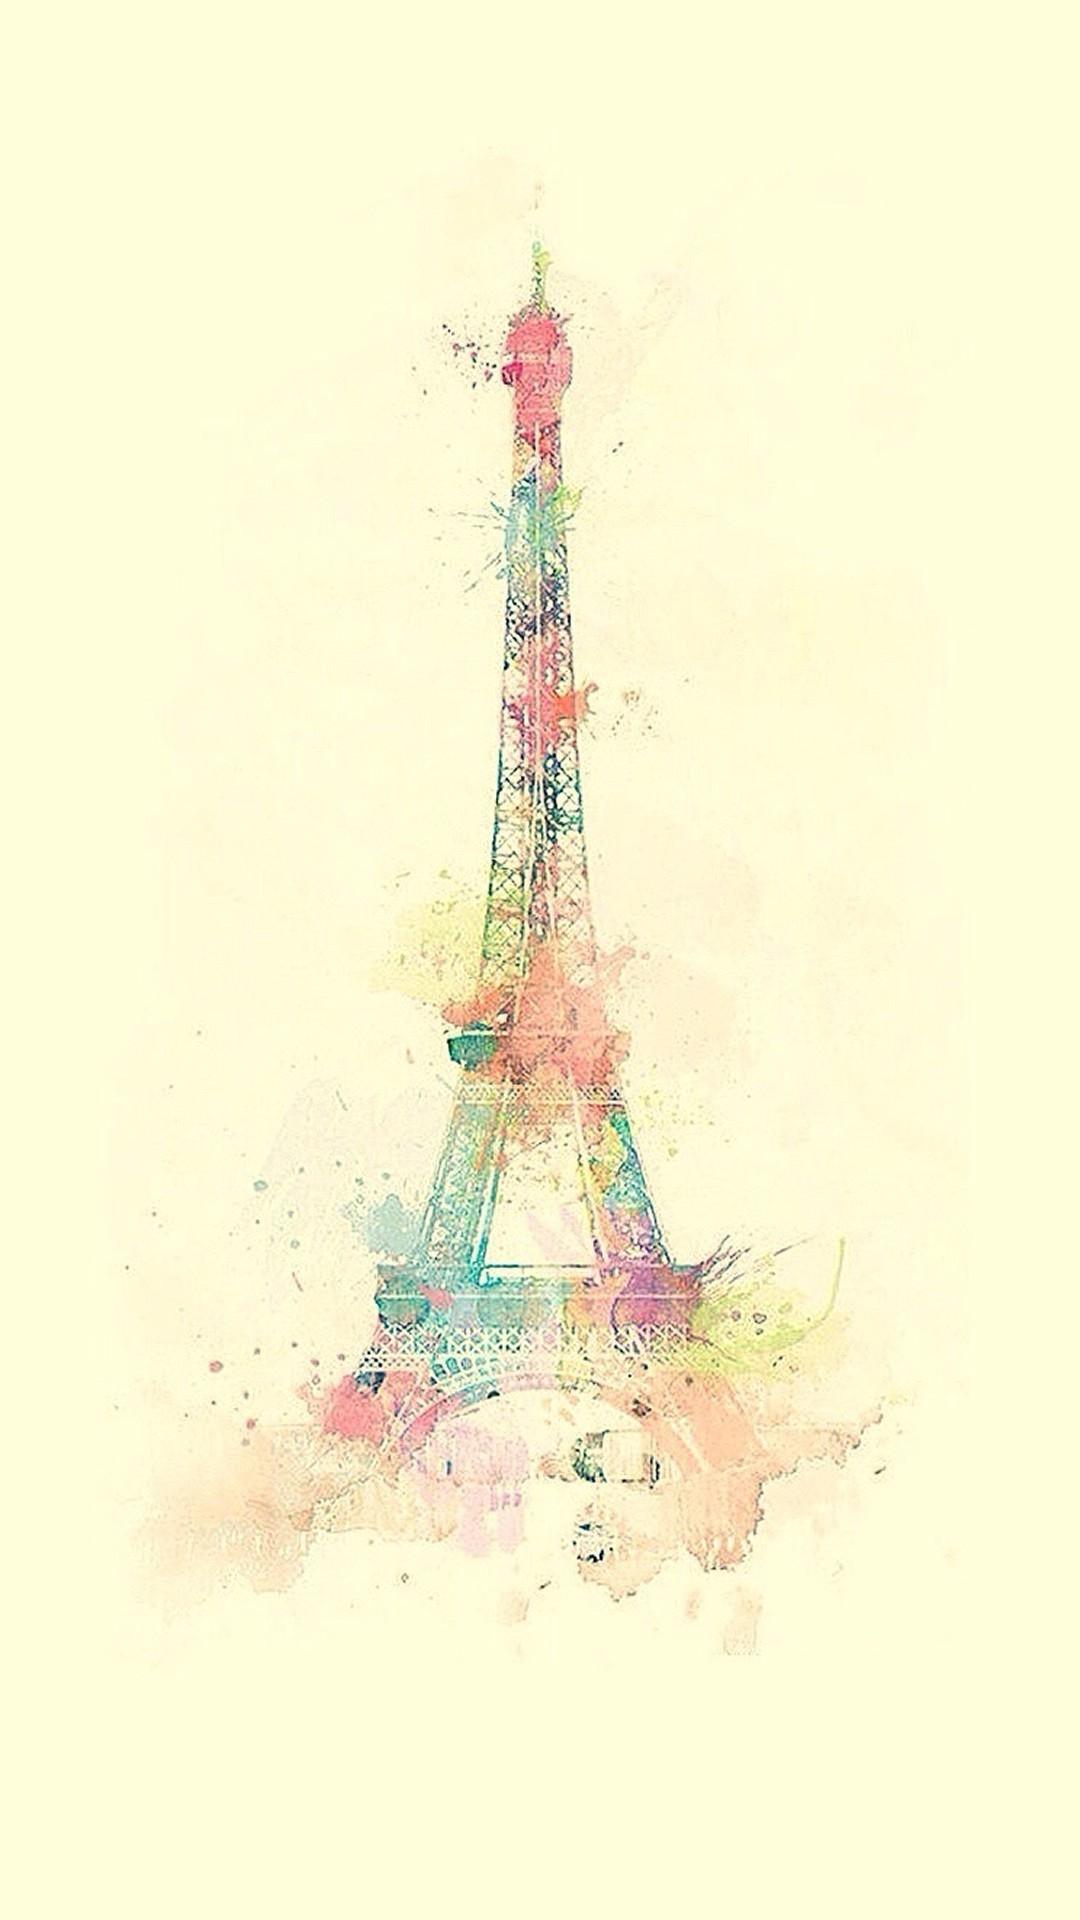 eiffel-tower-watercolor-paint-iphone-wallpaper-ilikewallpaper-com-